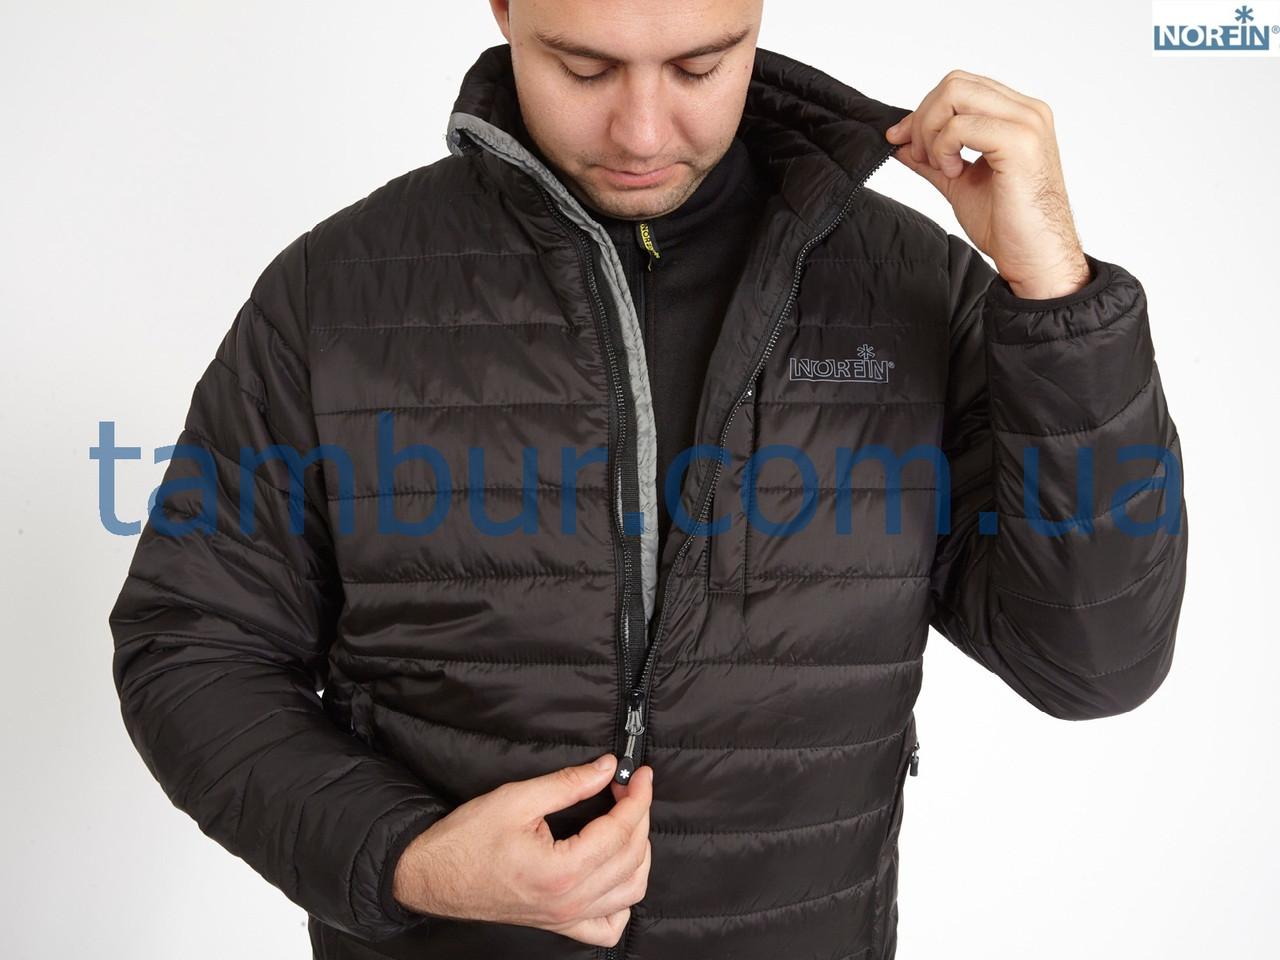 a5e0460fc1c0 ... Куртка демисезонная Norfin Air (охота, рыбалка, туризм), фото 4 ...